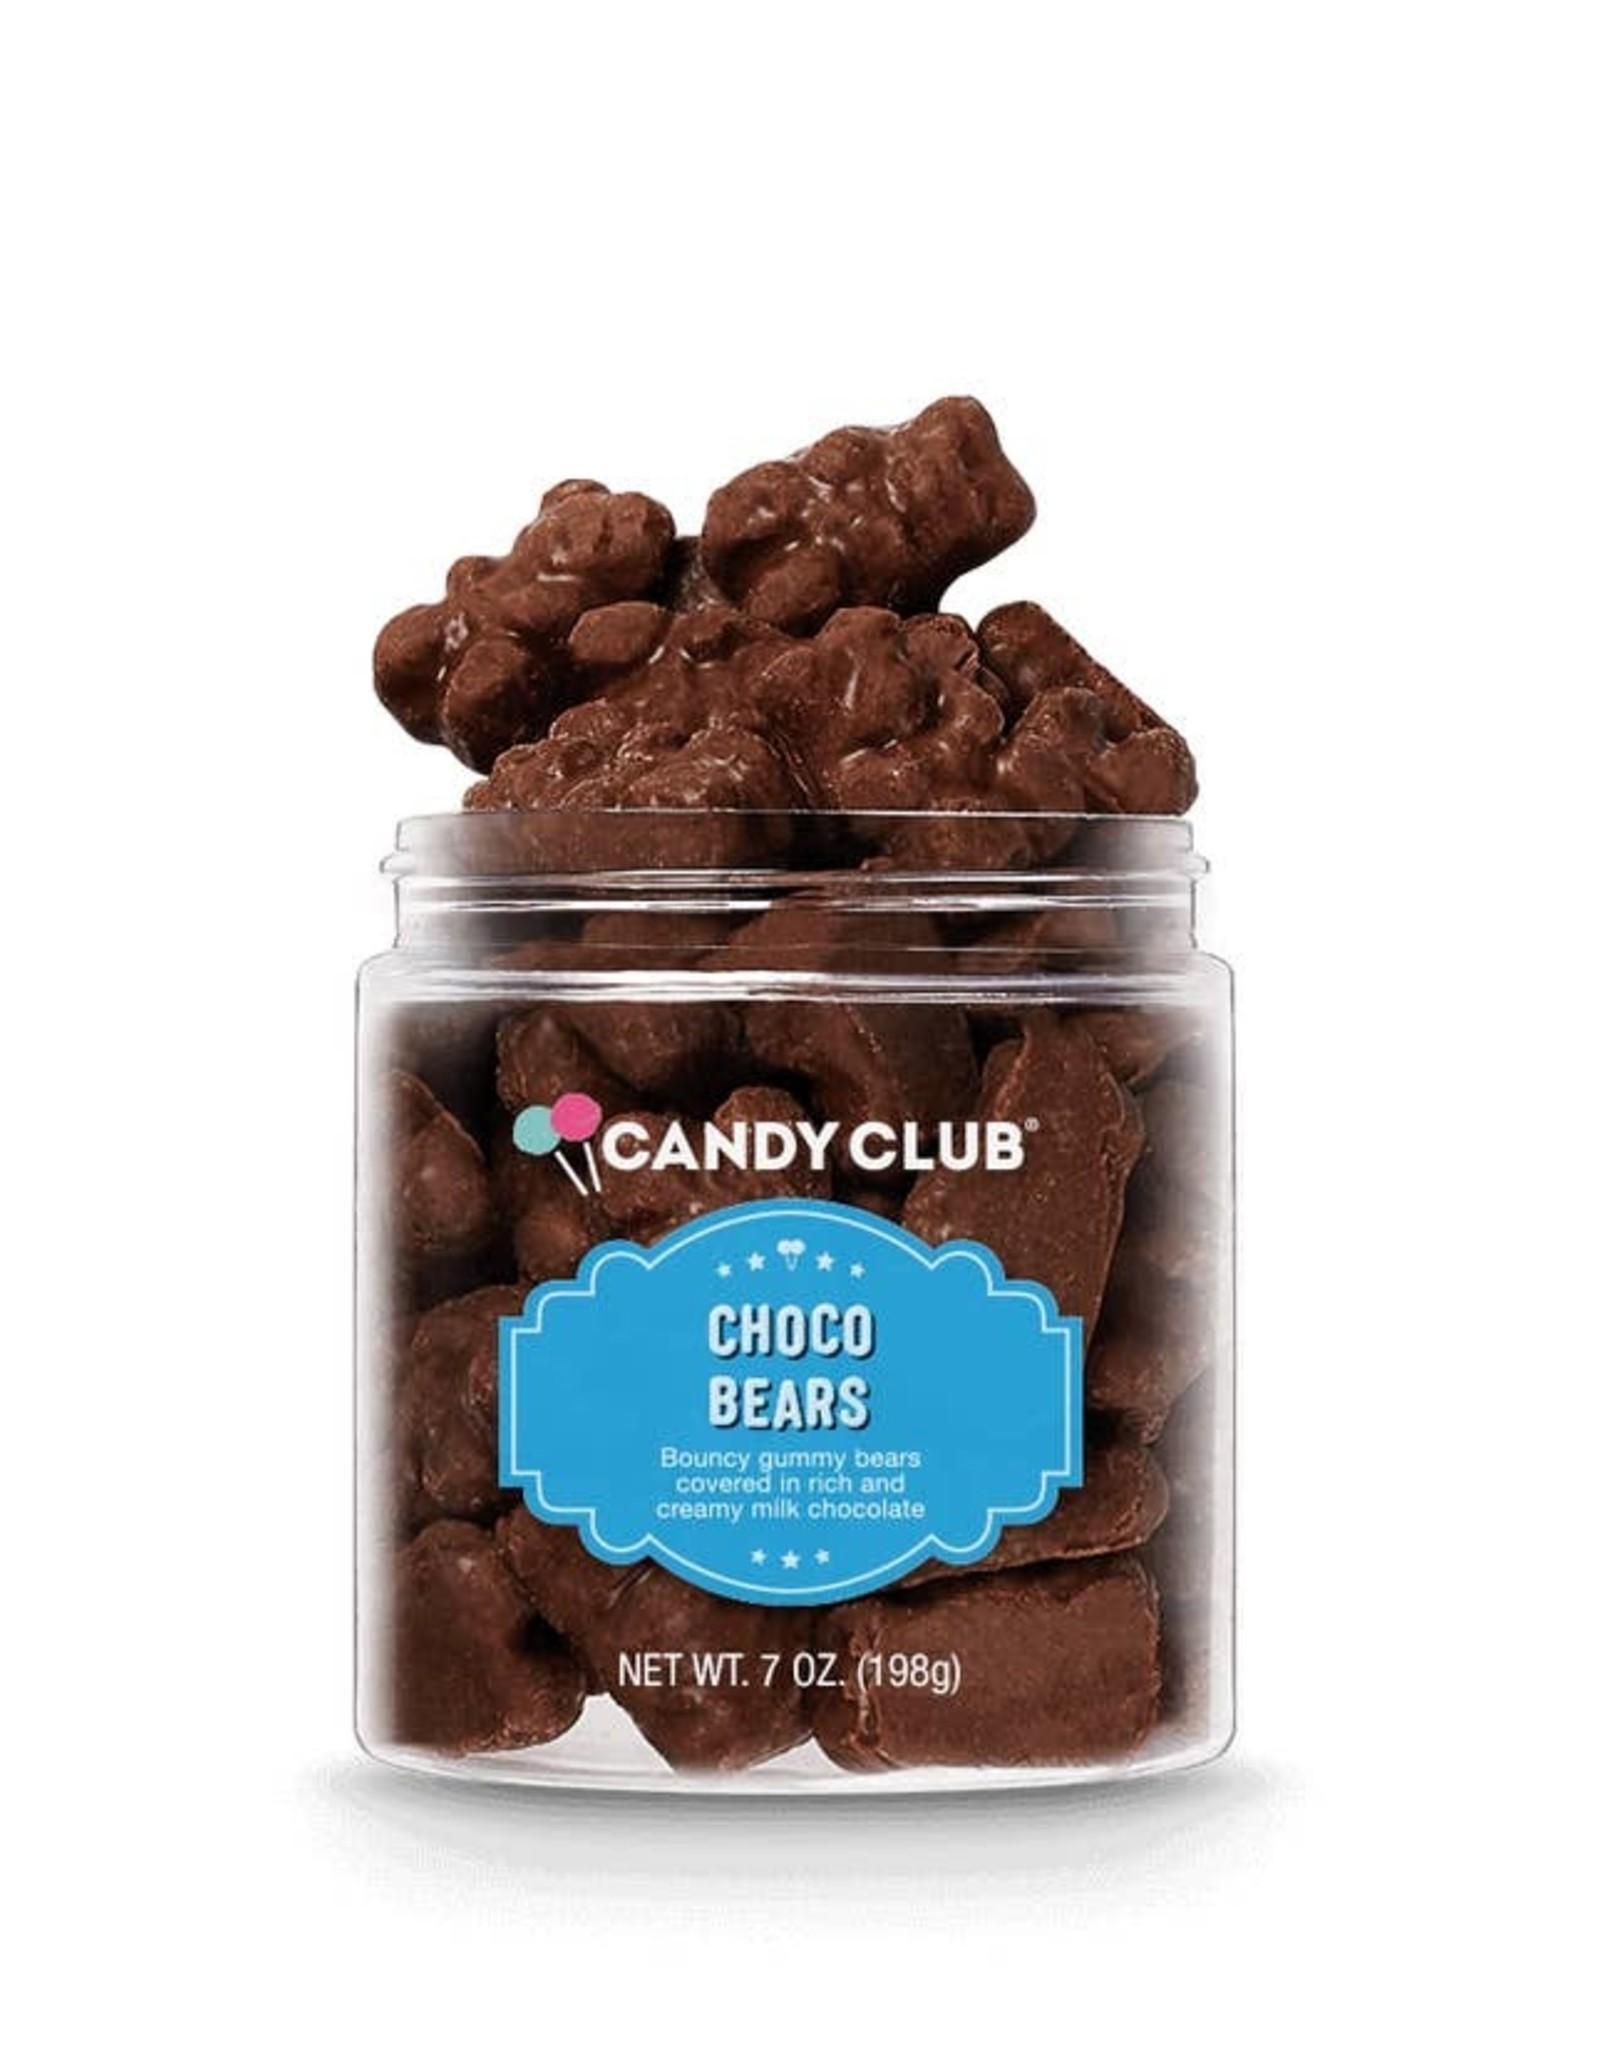 Candy Club Candy Club | Gummies and Chocolate